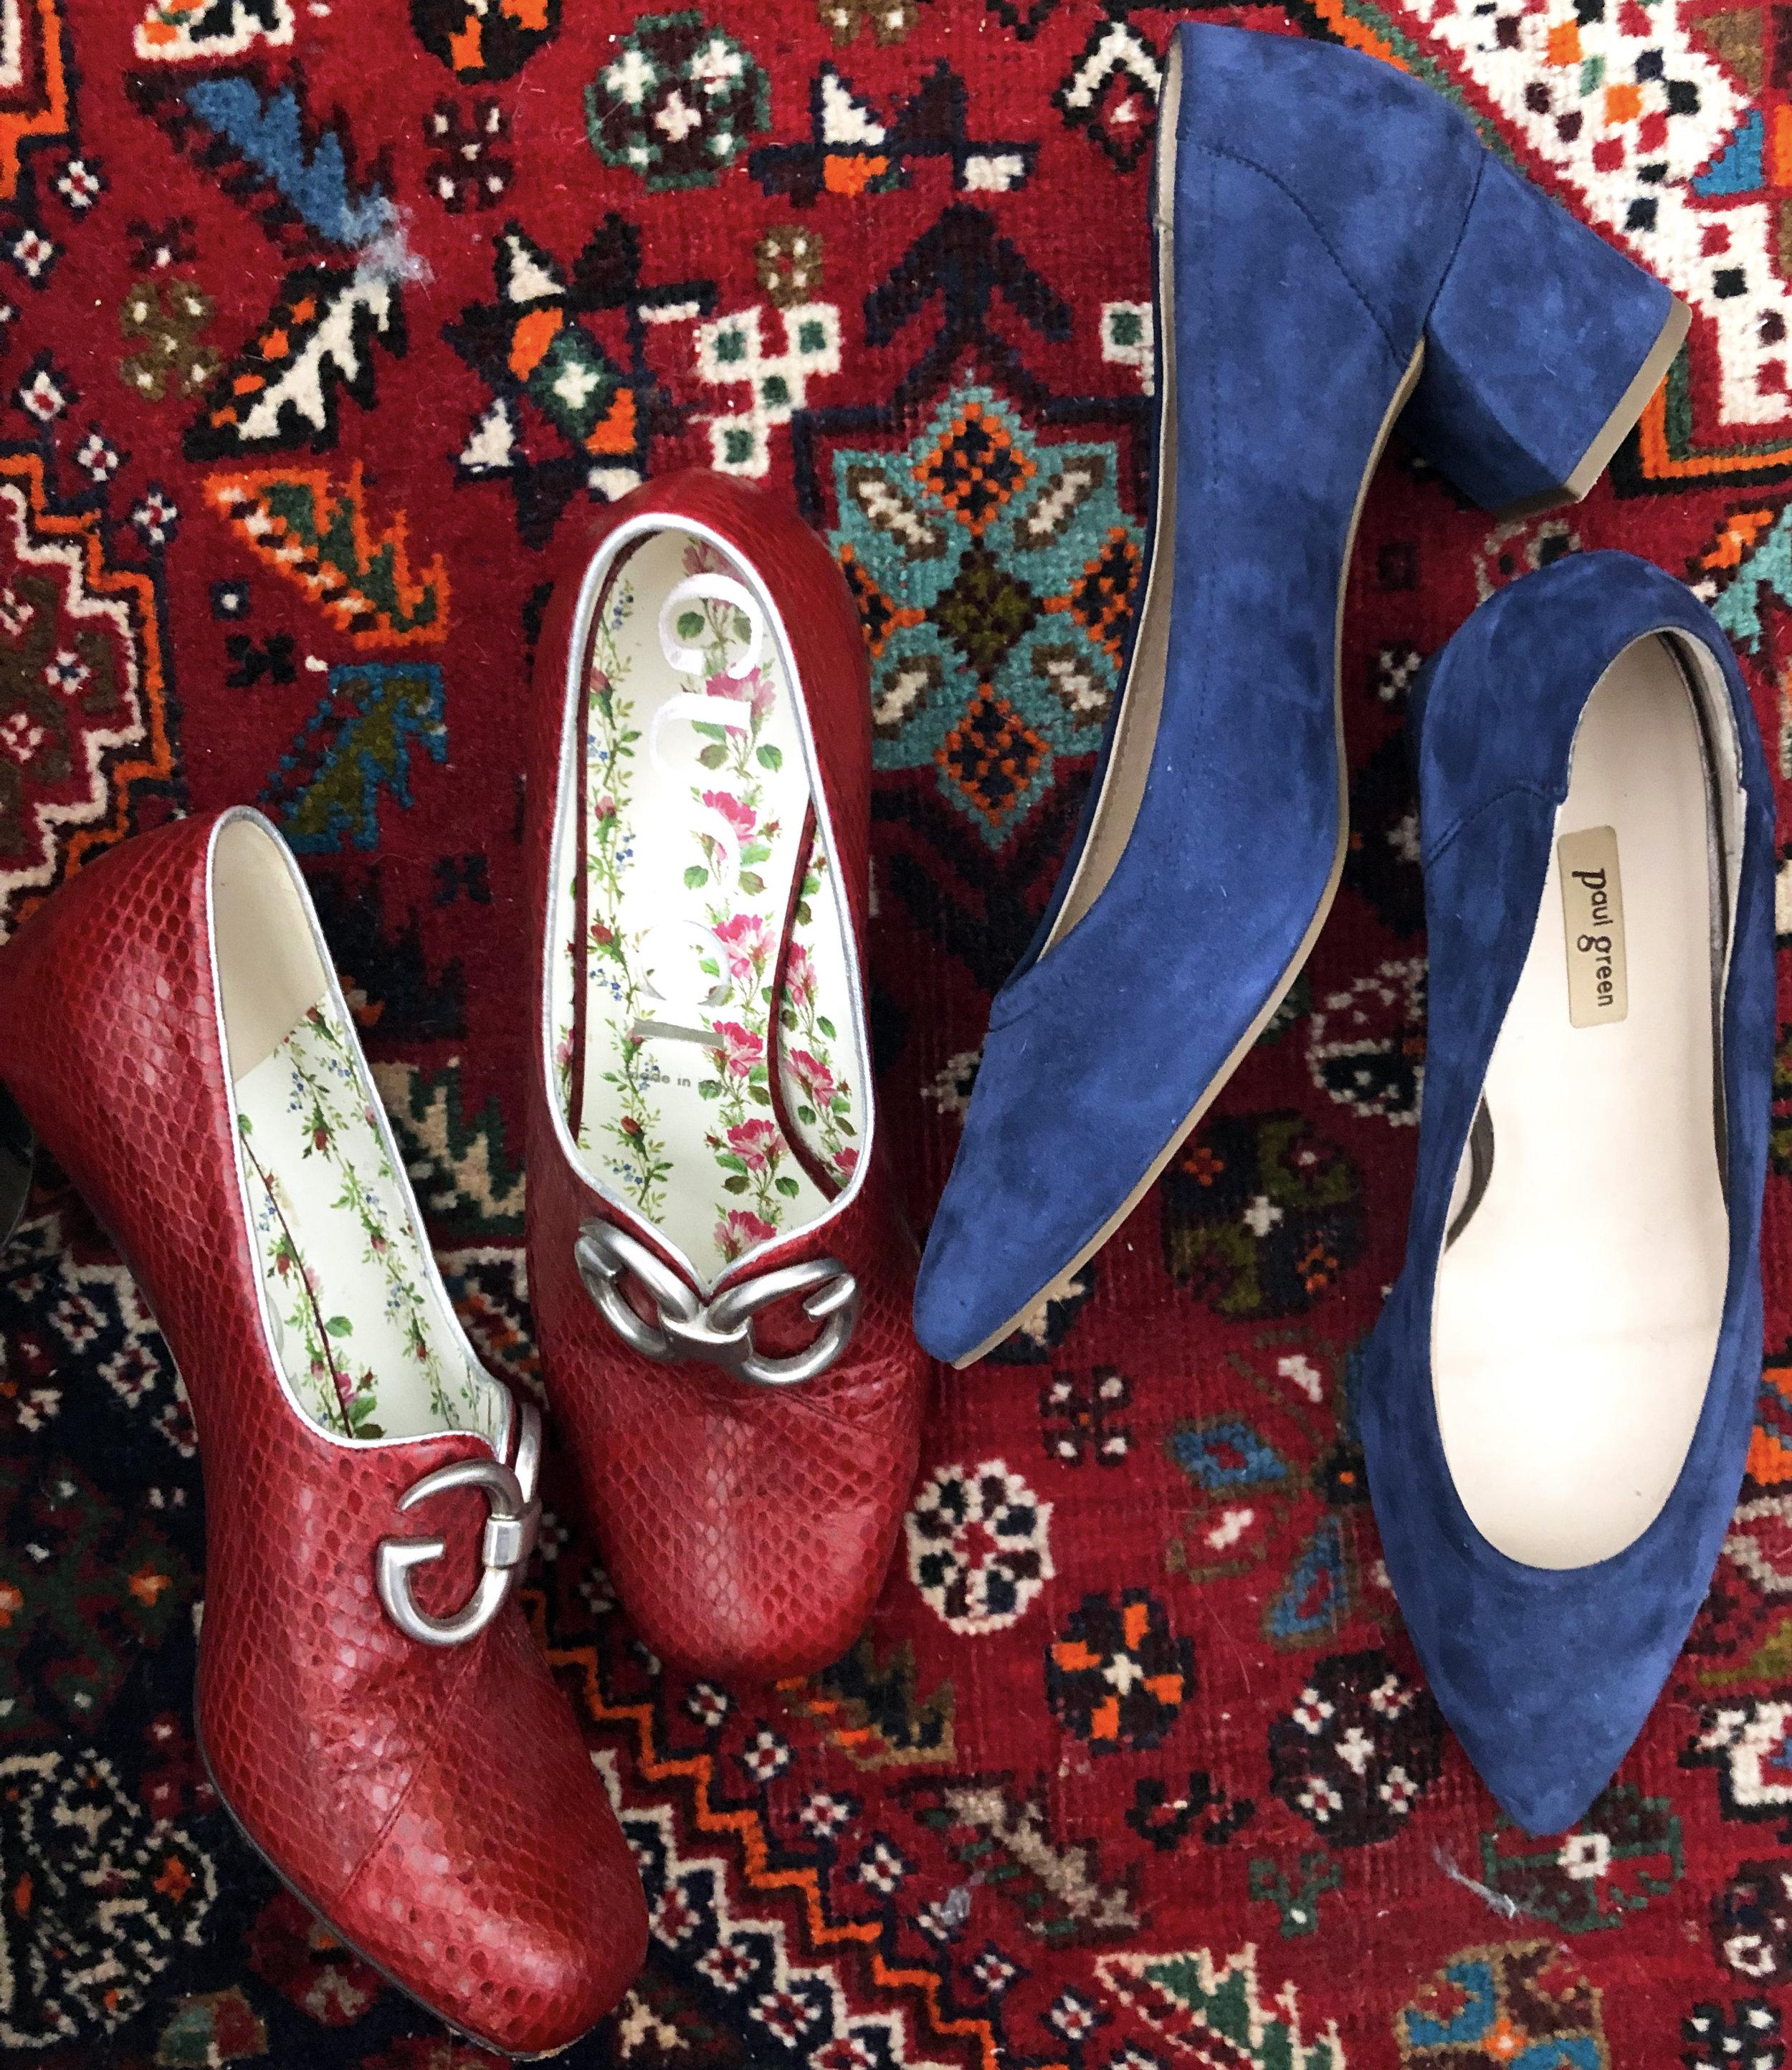 redshoes_blueshoes.jpg